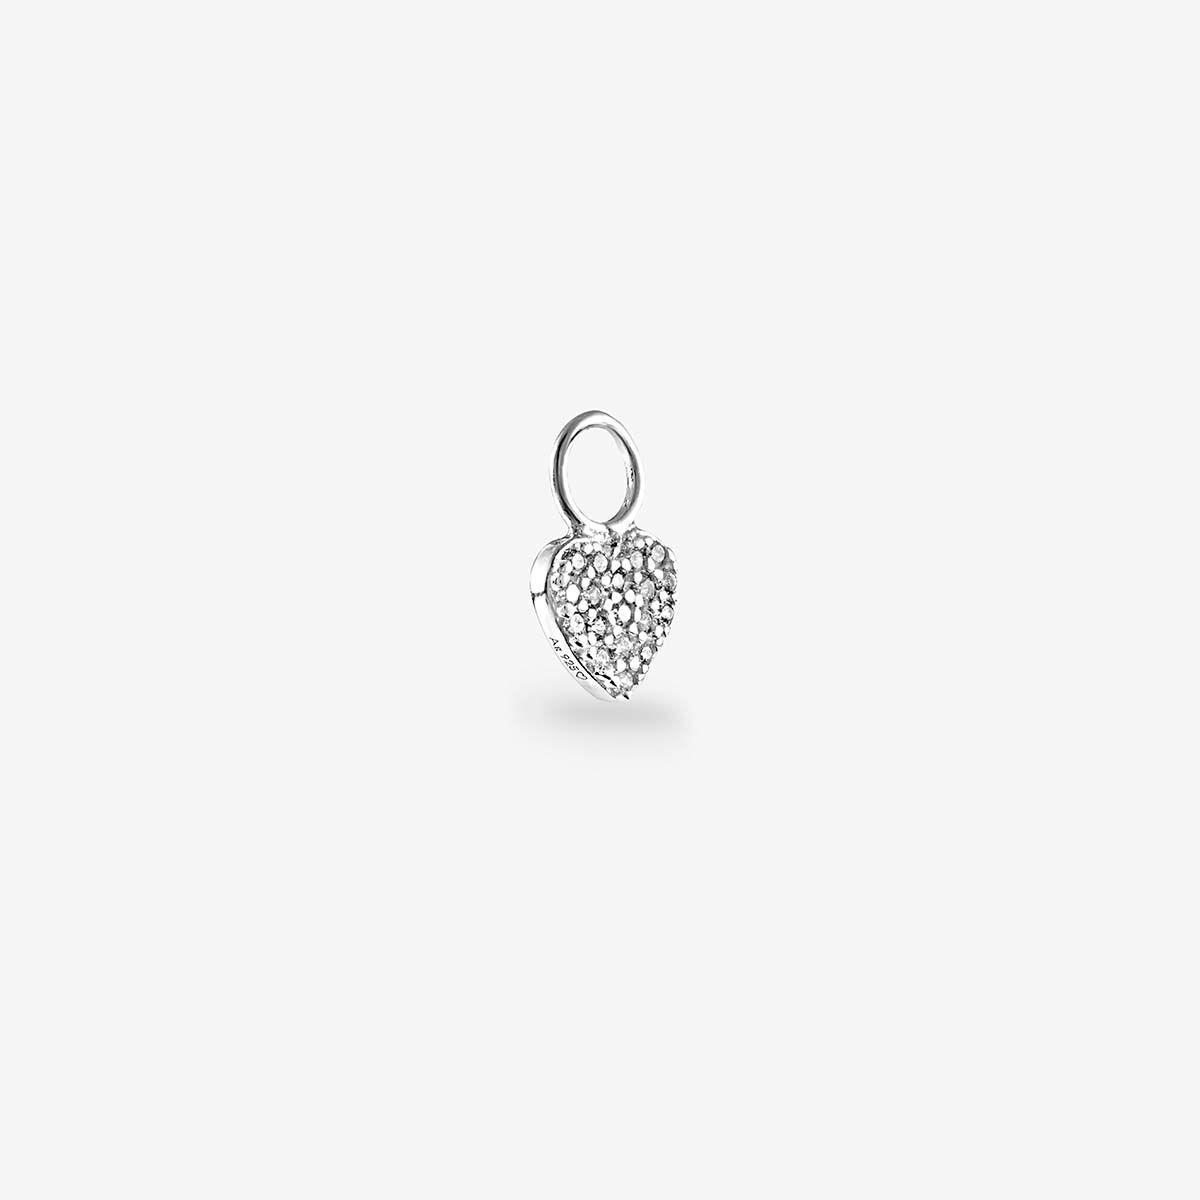 Herz Zirkonia Anhänger Sillber - Ohrring Anhänger - Silber